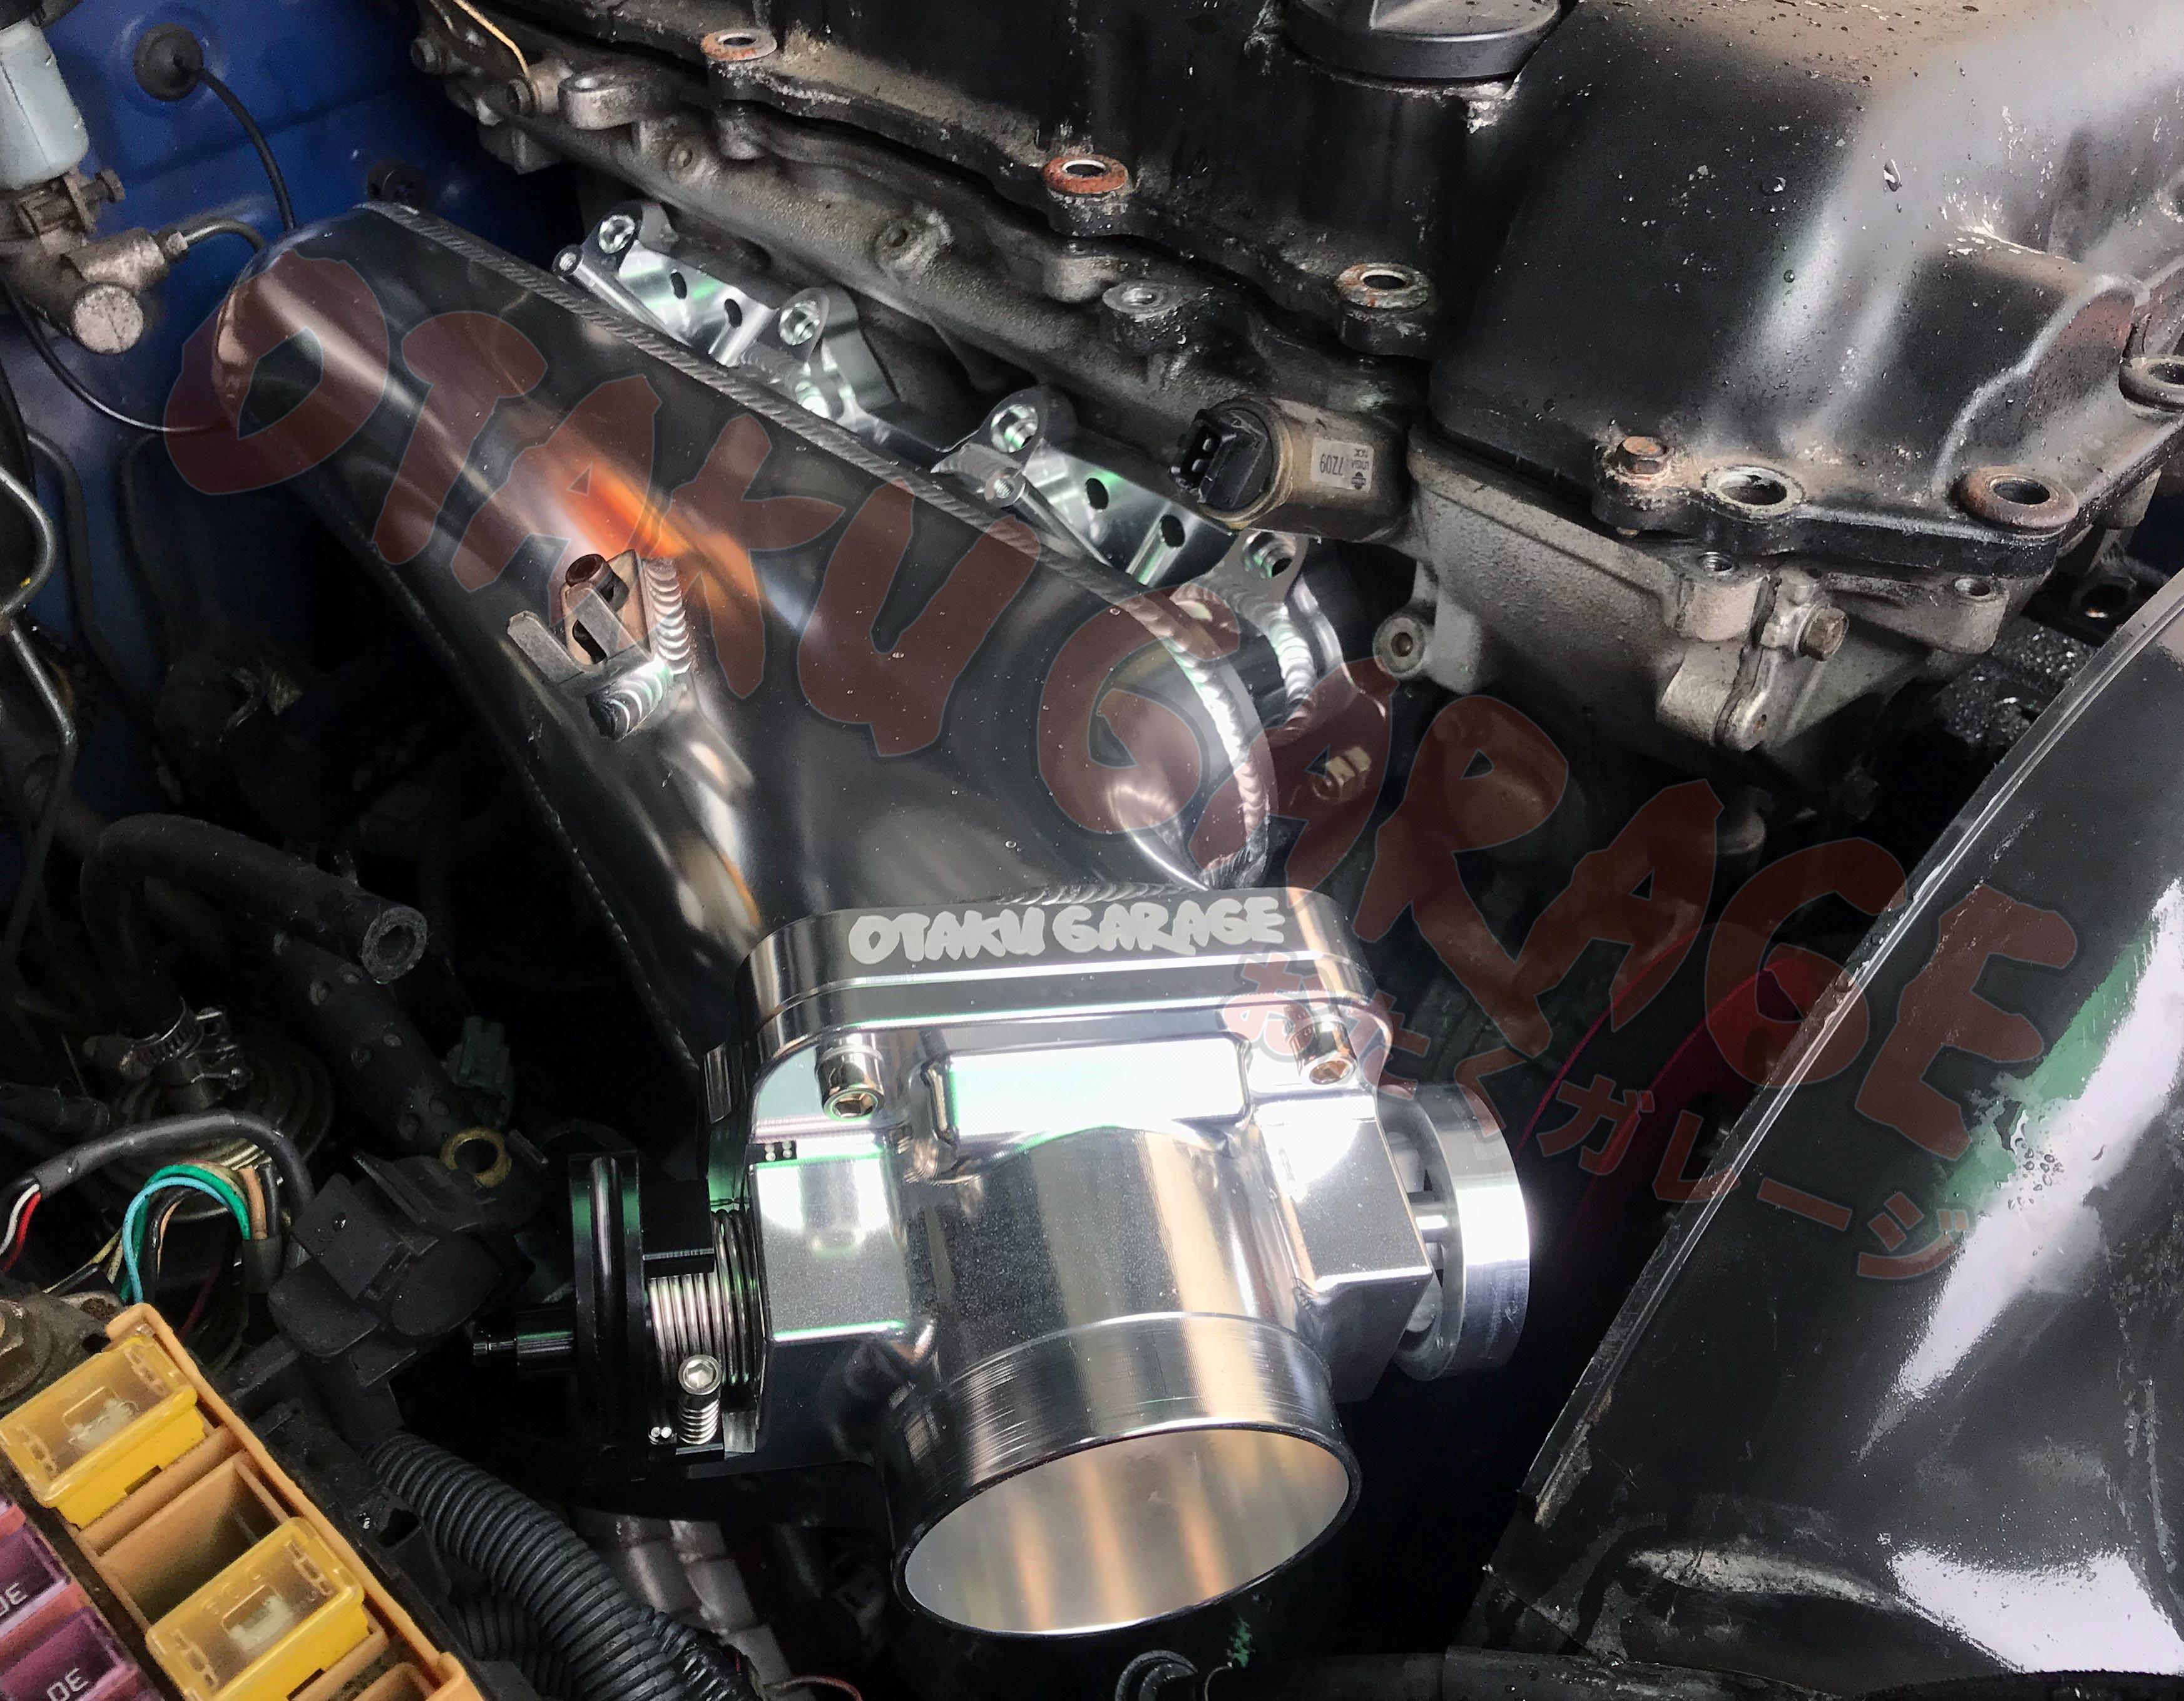 Otaku Garage Billet Intake Manifold/ Forward Facing Plenum - SR20DET S13/  S14/ S15/ 180SX/ 240SX